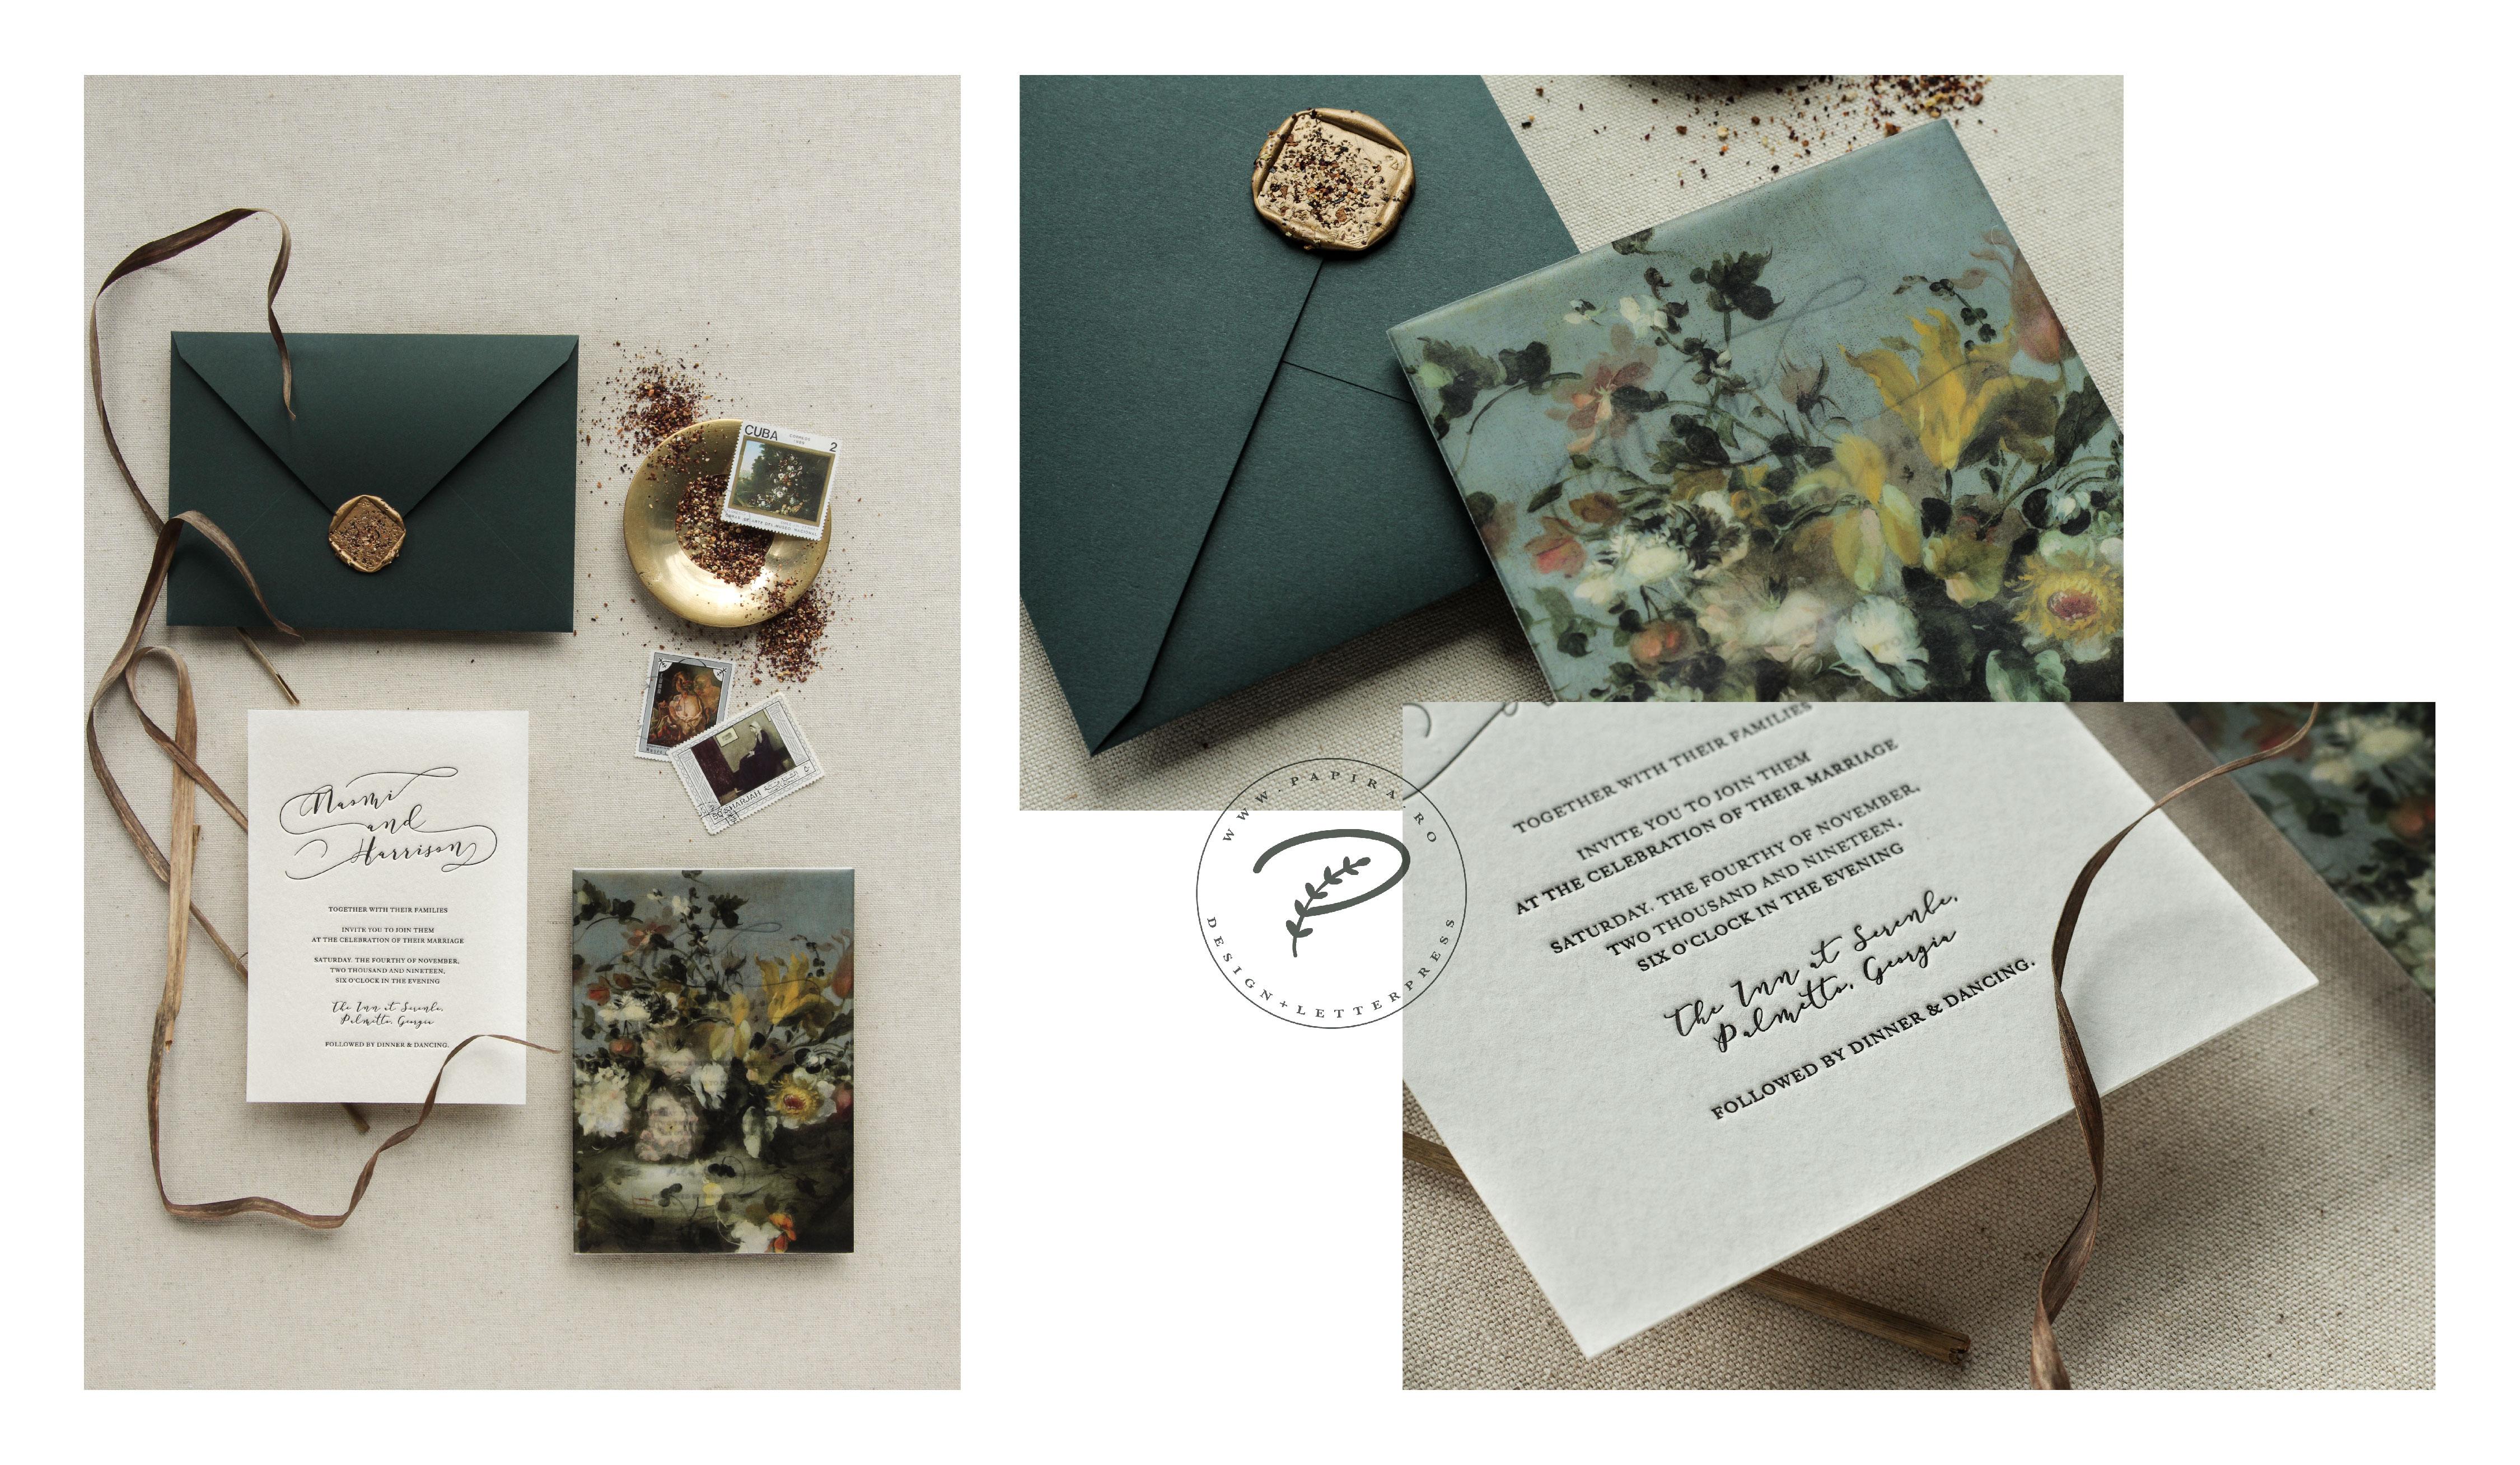 Invitatii de nunta personalizate, letterpress, hartie manuala si sigiliu ceara